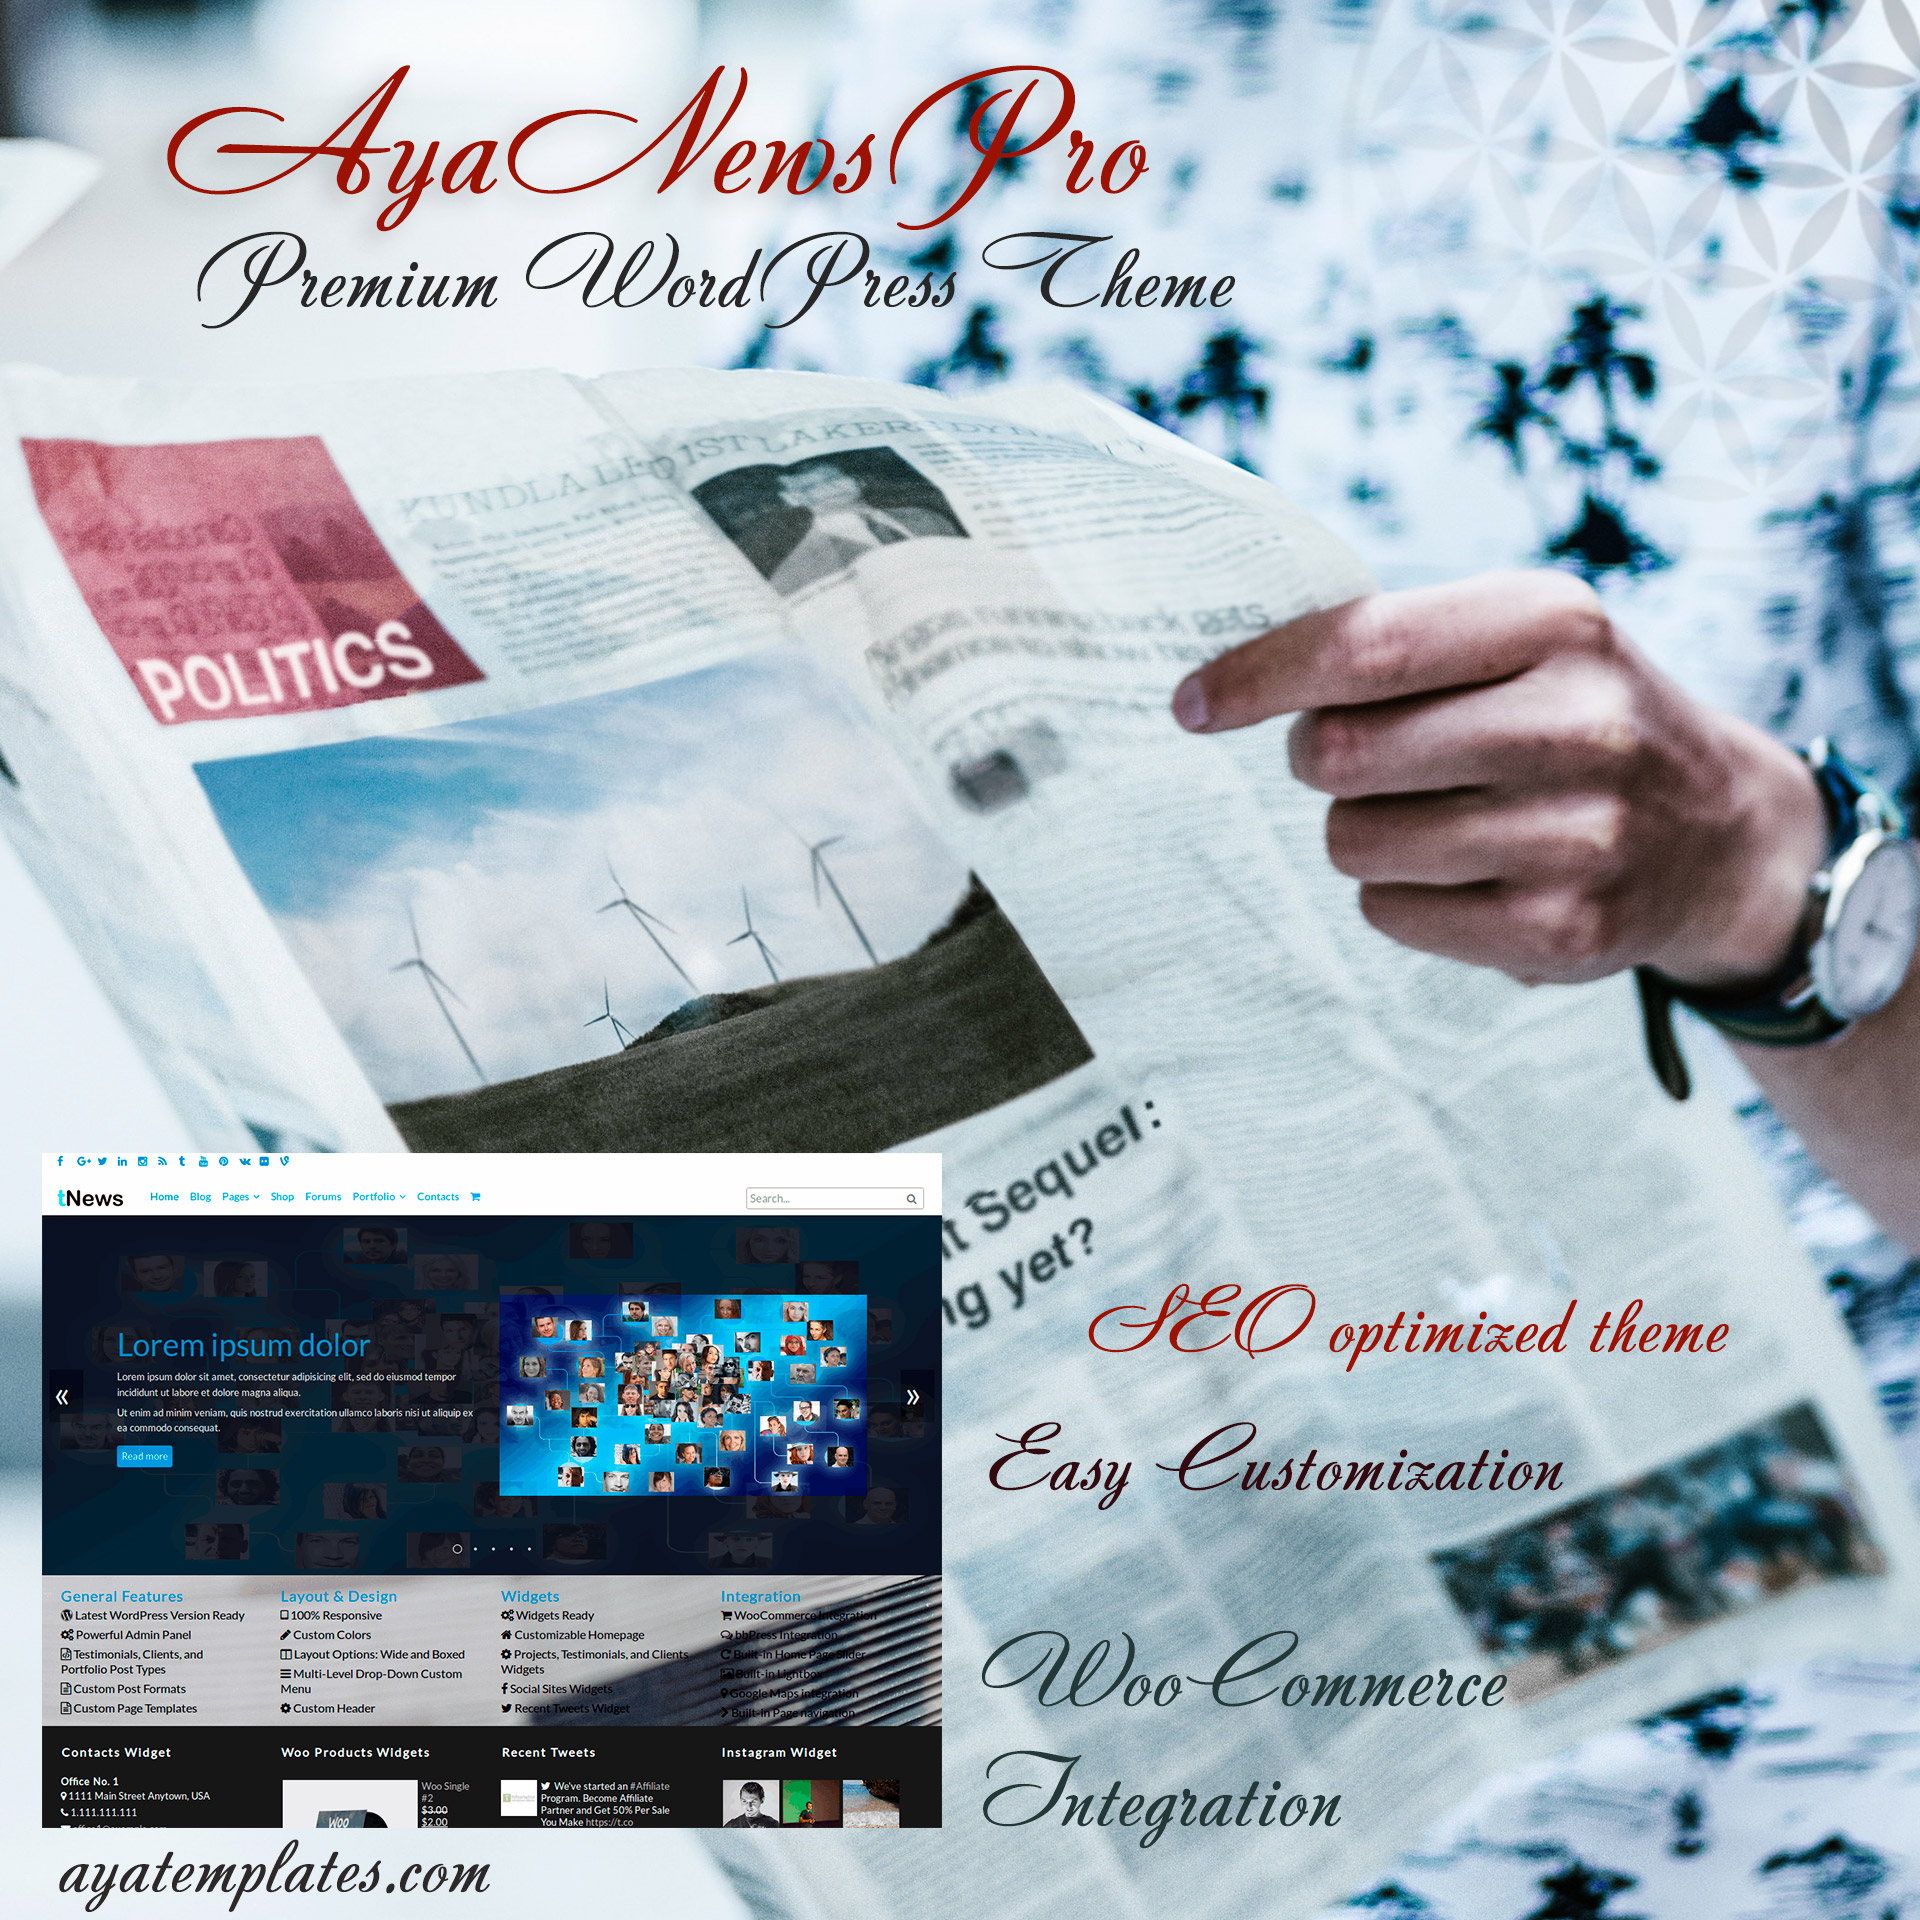 AyaNewsPro-premium-wordpress-theme-mockup-ayatemplates-com